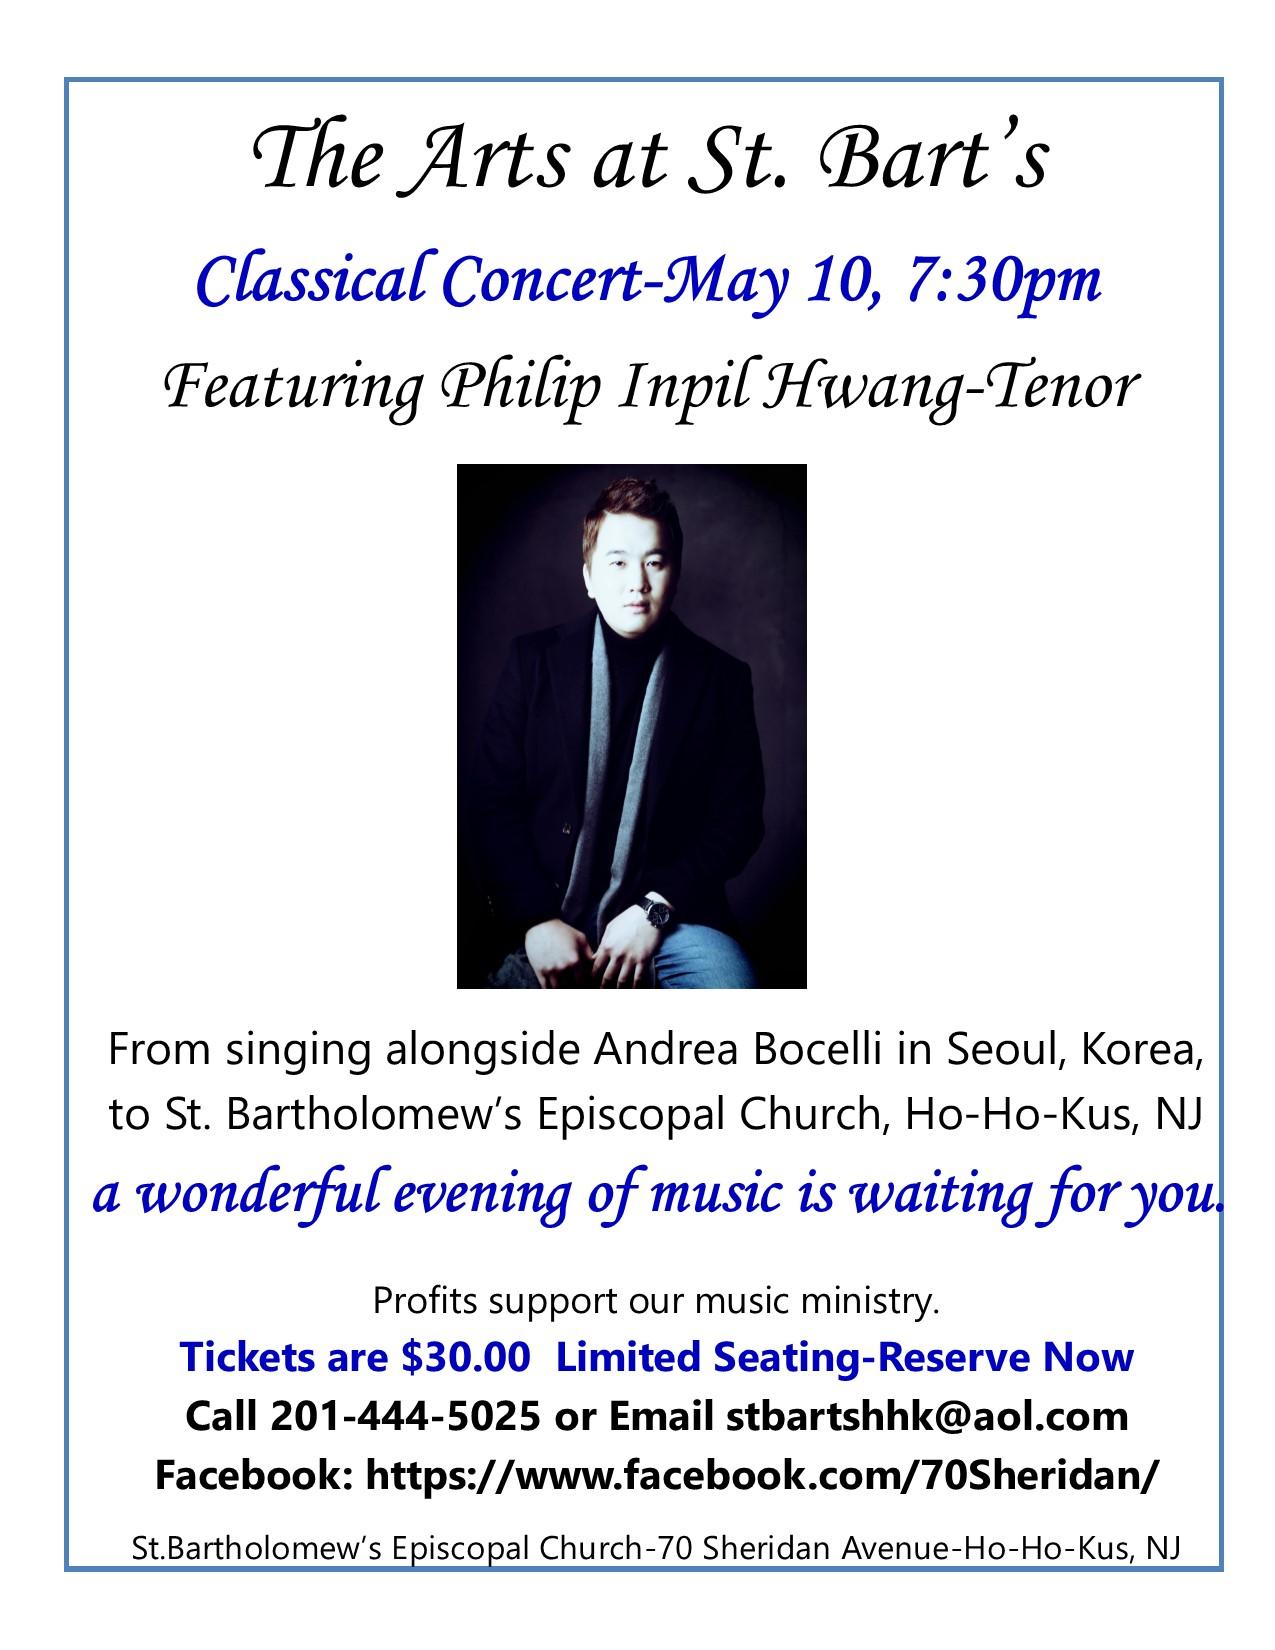 Classical Music Concert-May 10 - St  Bartholomew's Episcopal